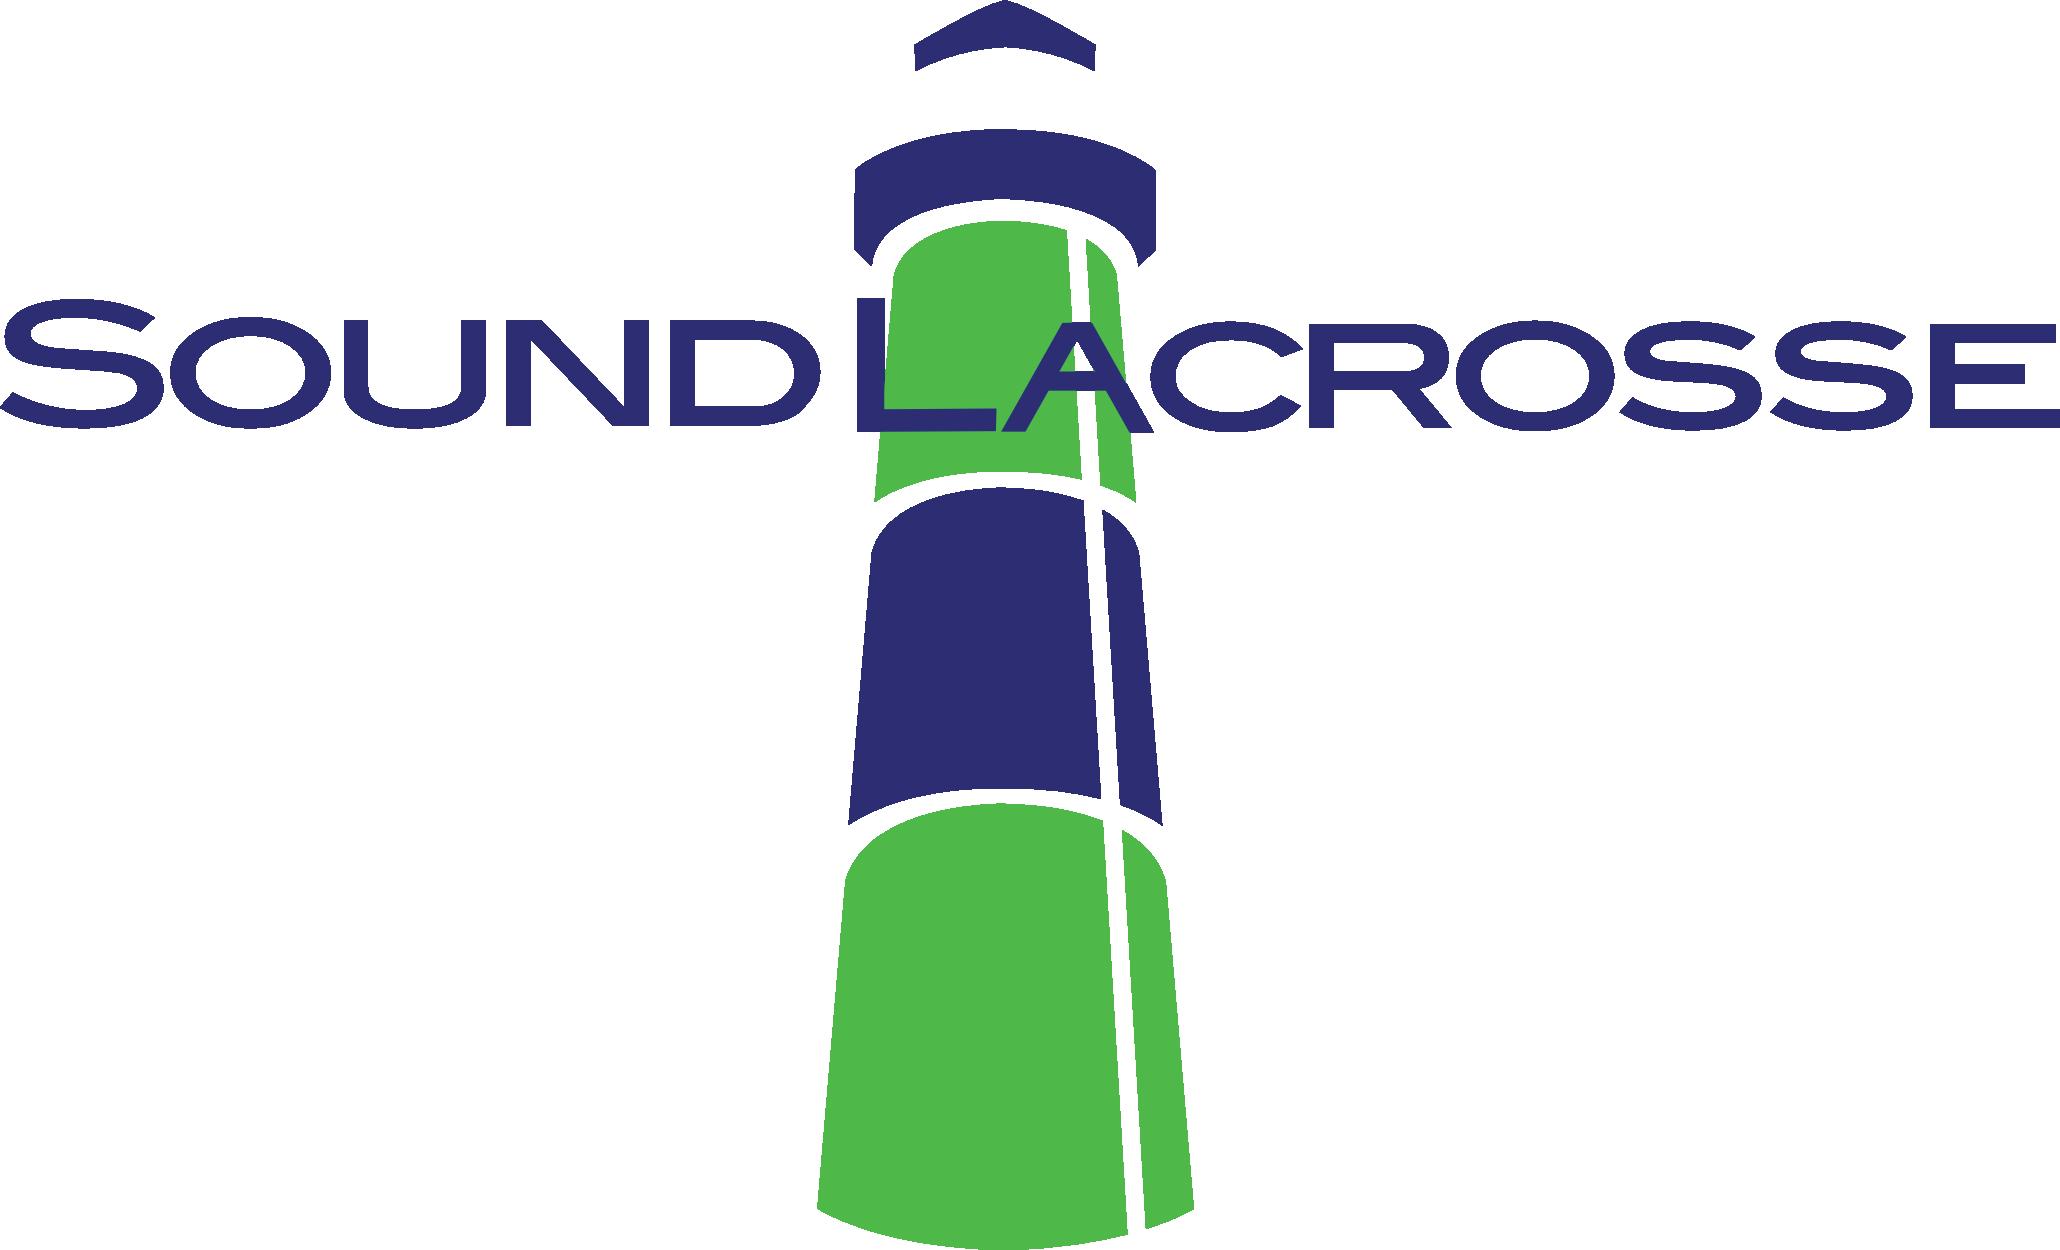 Sound Lacrosse